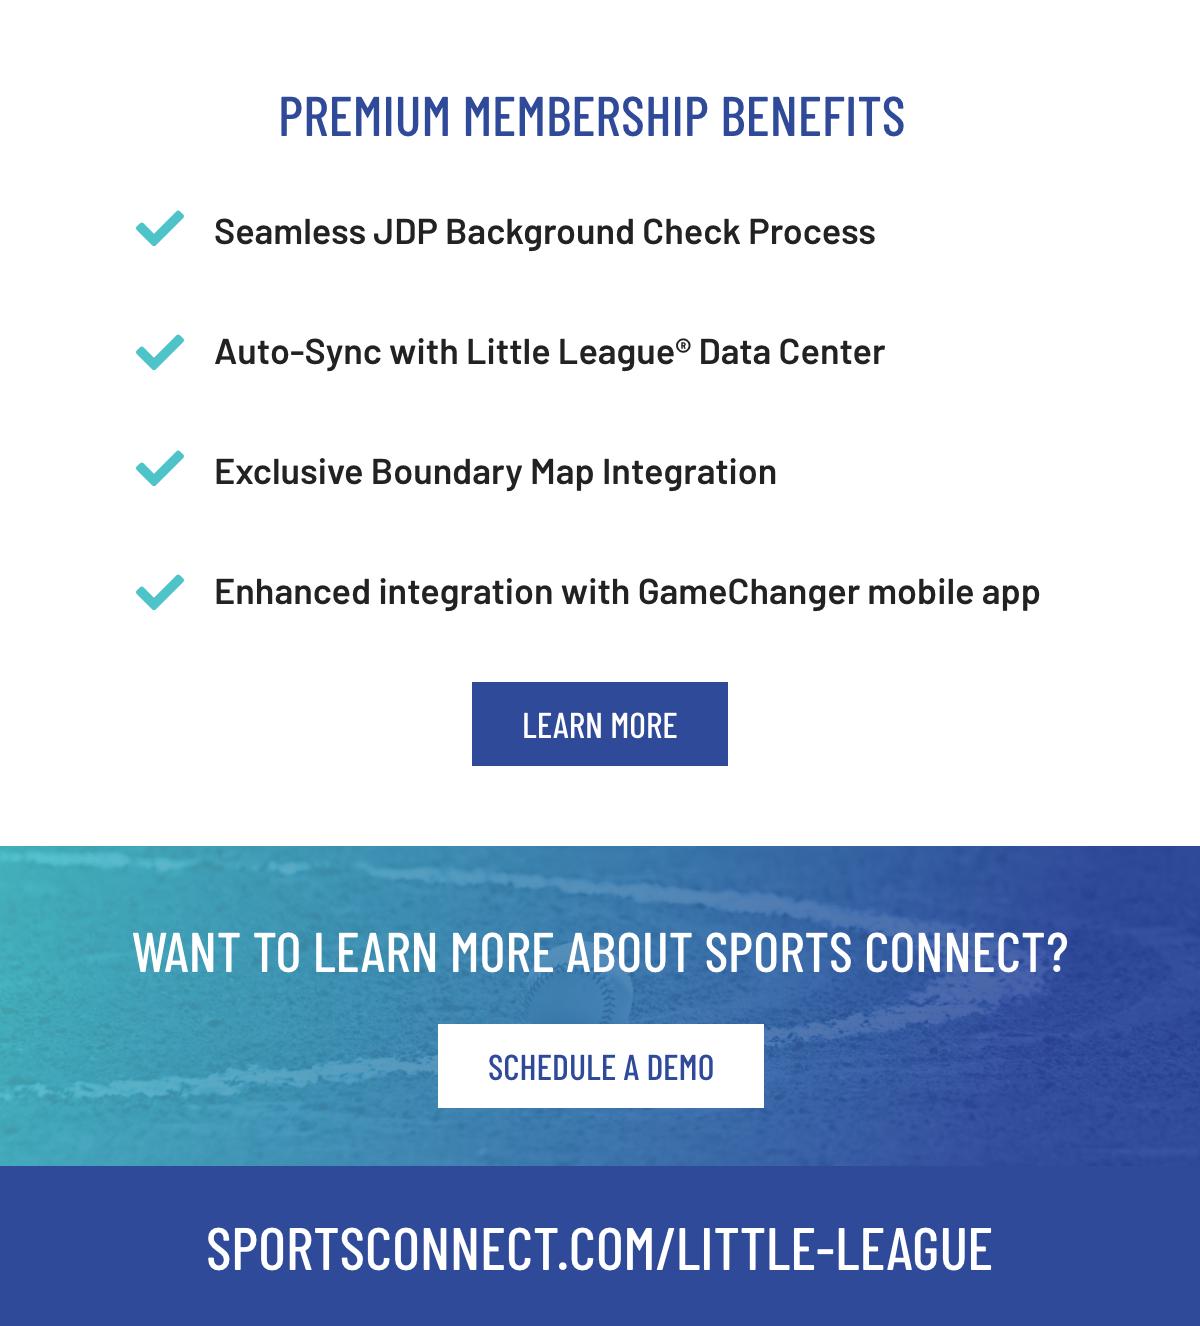 Premium Membership Benefits and Schedule A Demo